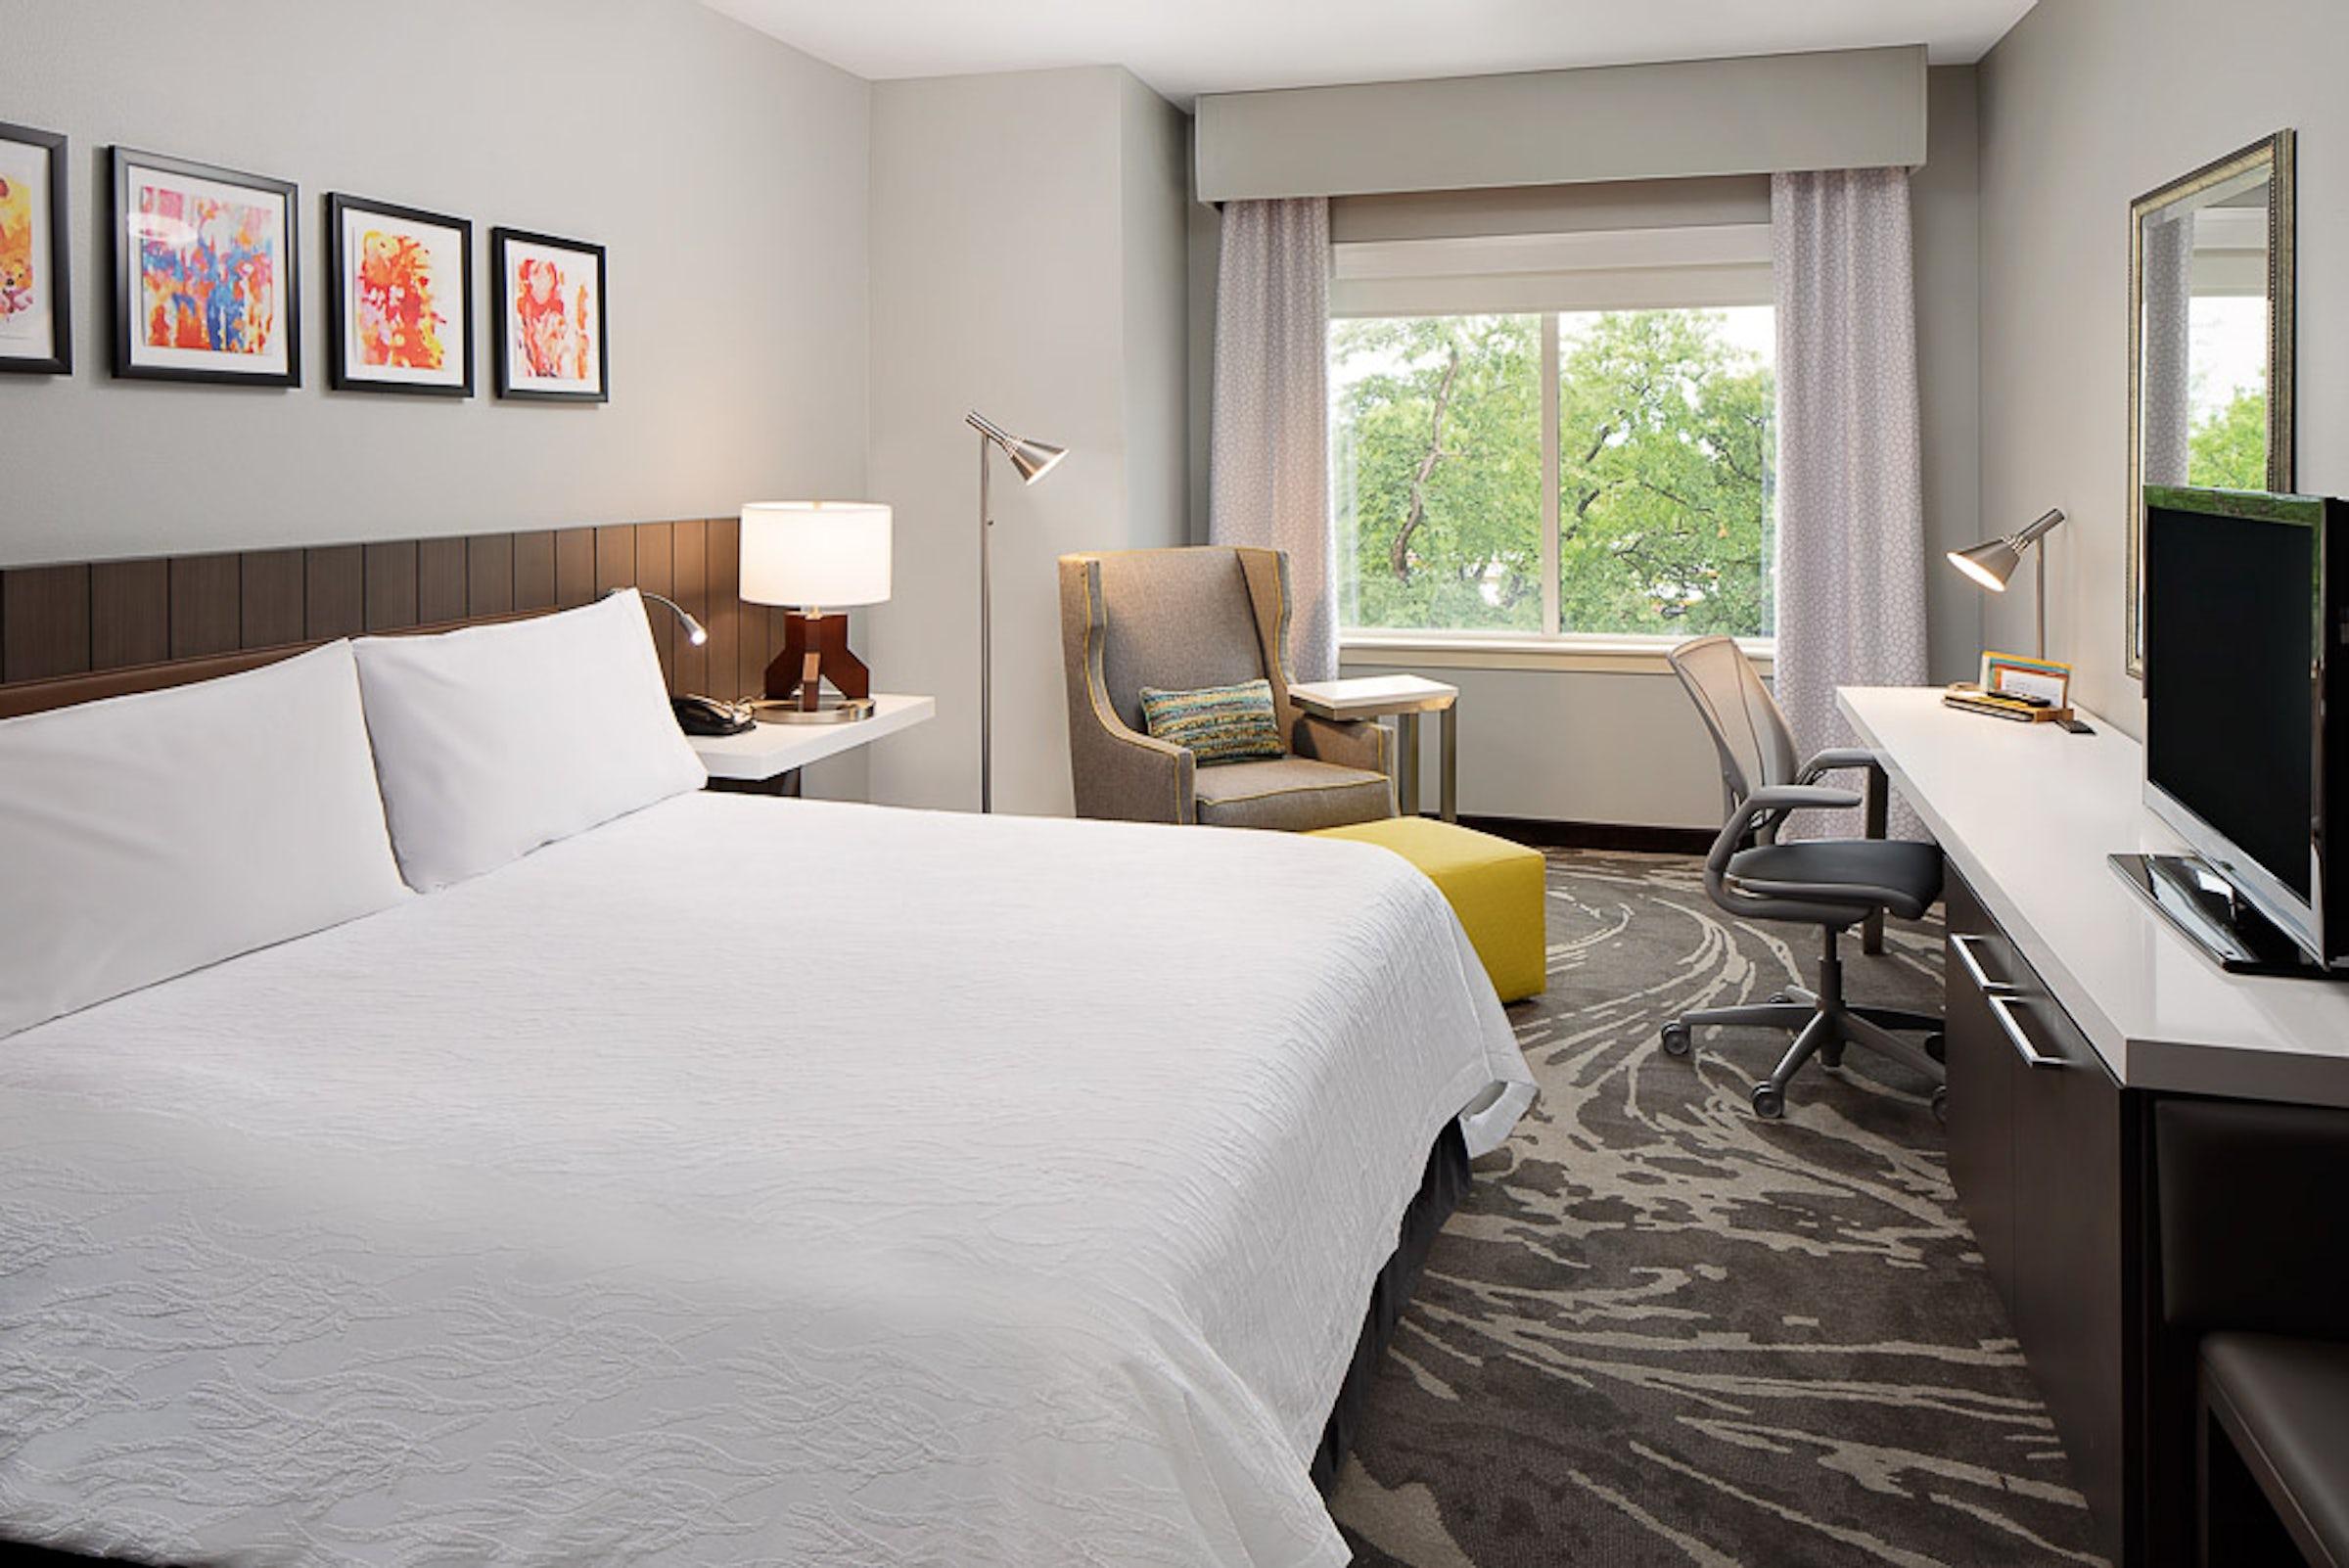 Hilton Garden Inn DFW South in Beyond Dallas